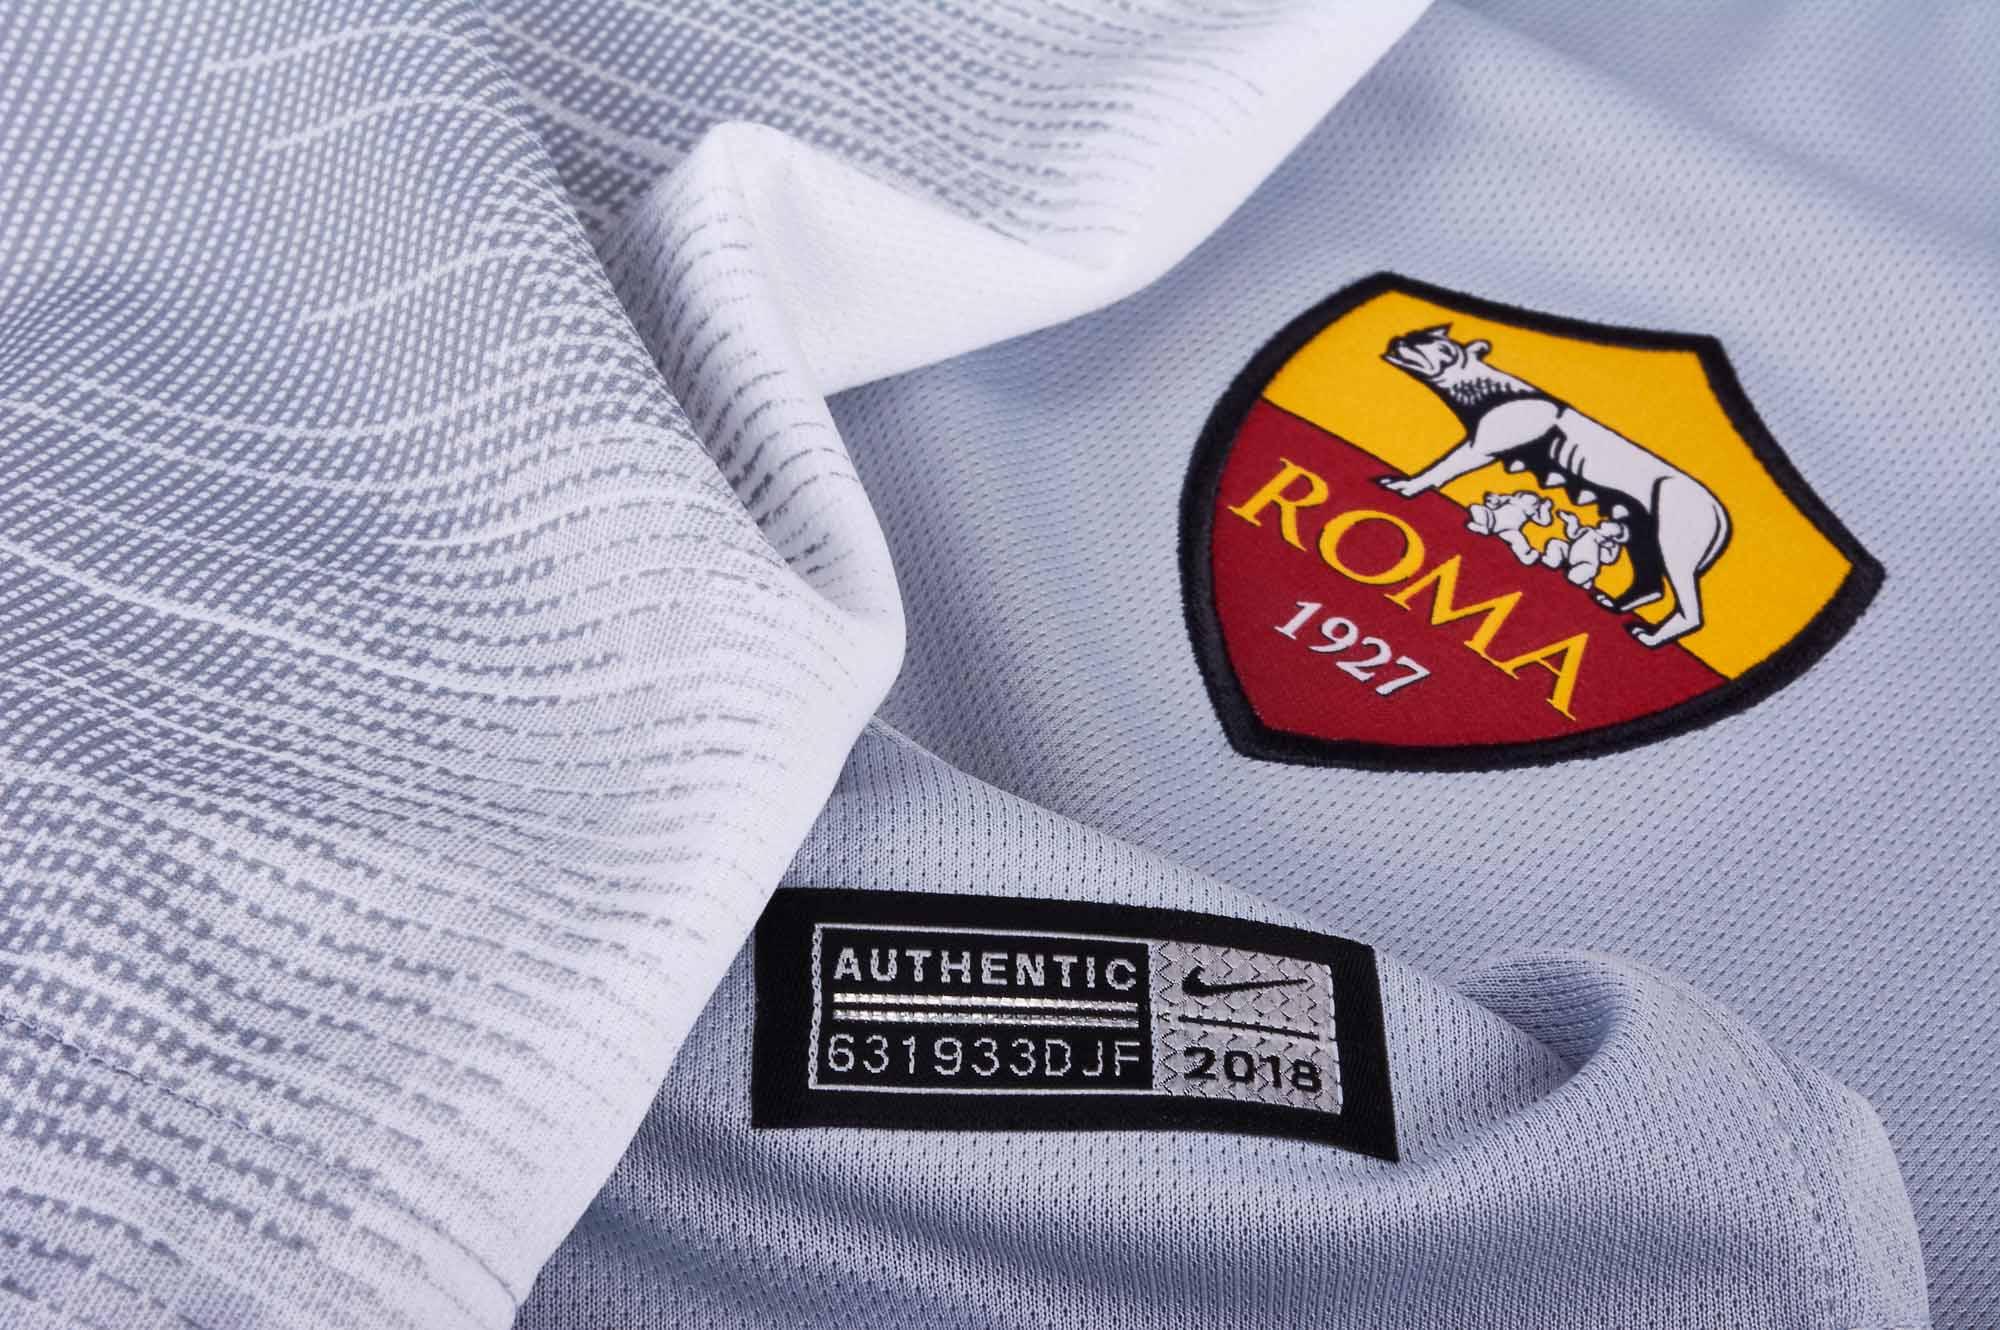 cheaper 46fa4 d852e Nike Roma Away Jersey - Wolf Grey/Black - SoccerPro